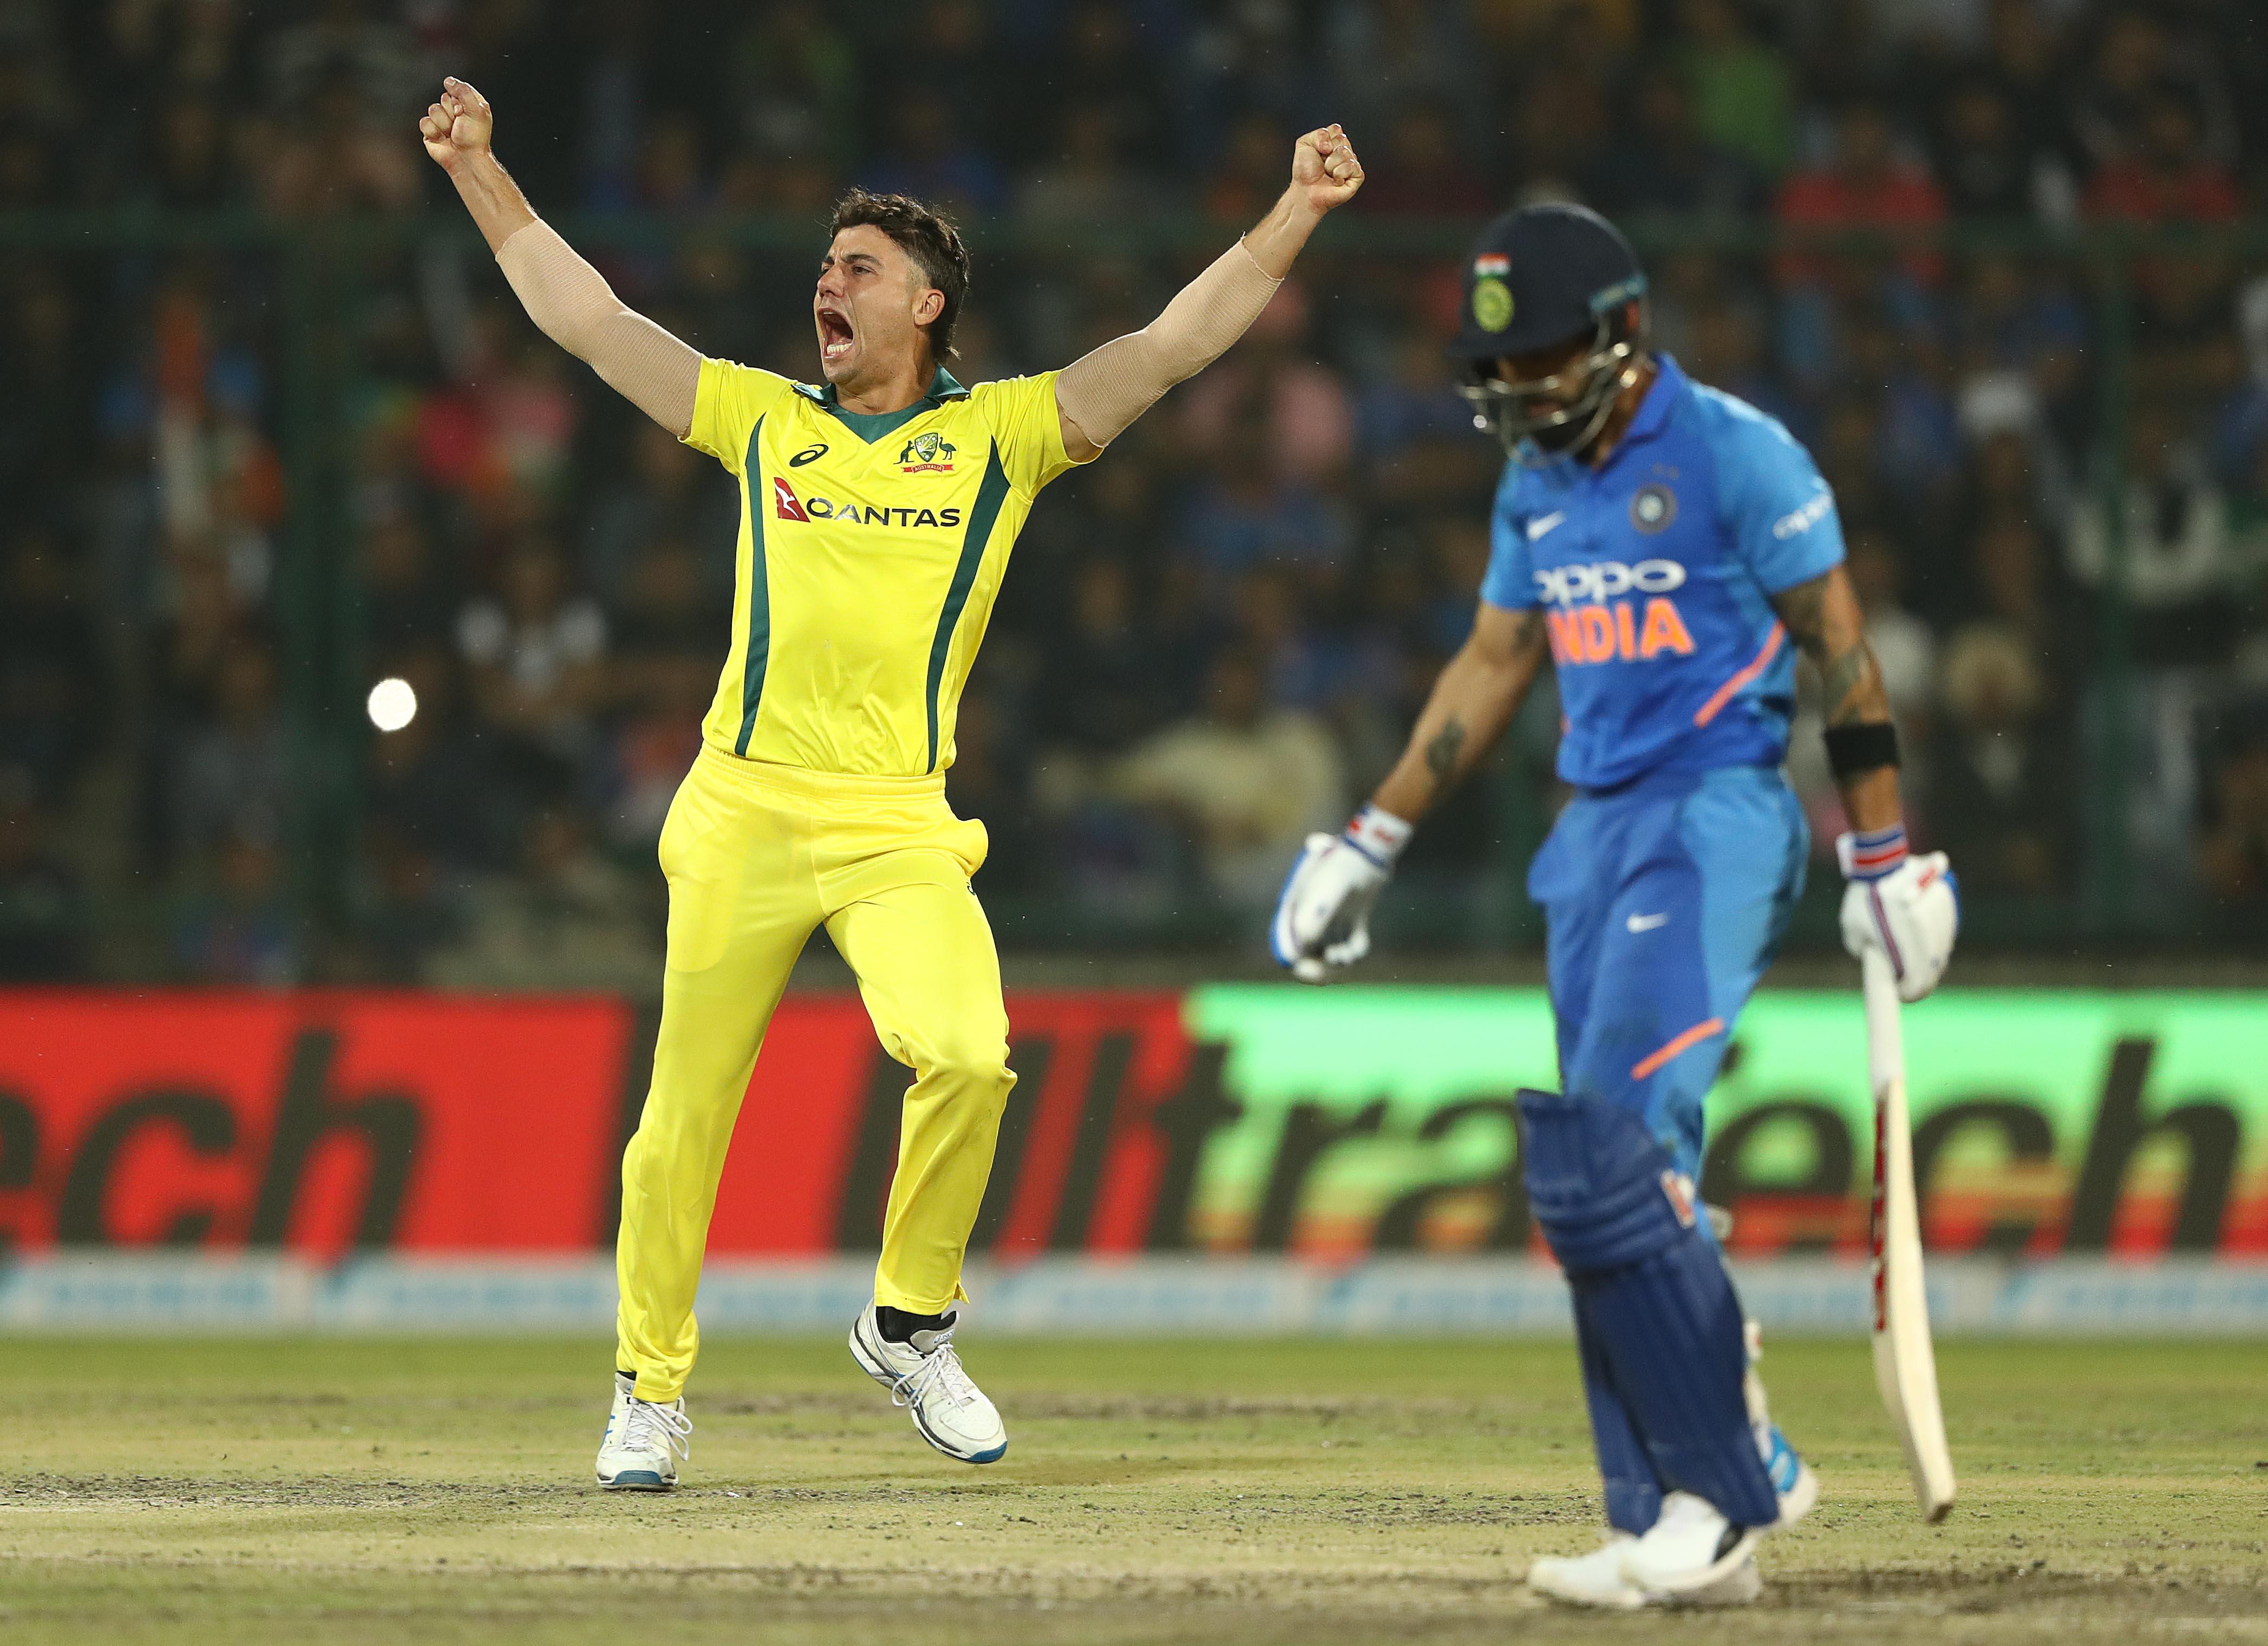 Stoinis celebrates the key wicket of Kohli // Getty